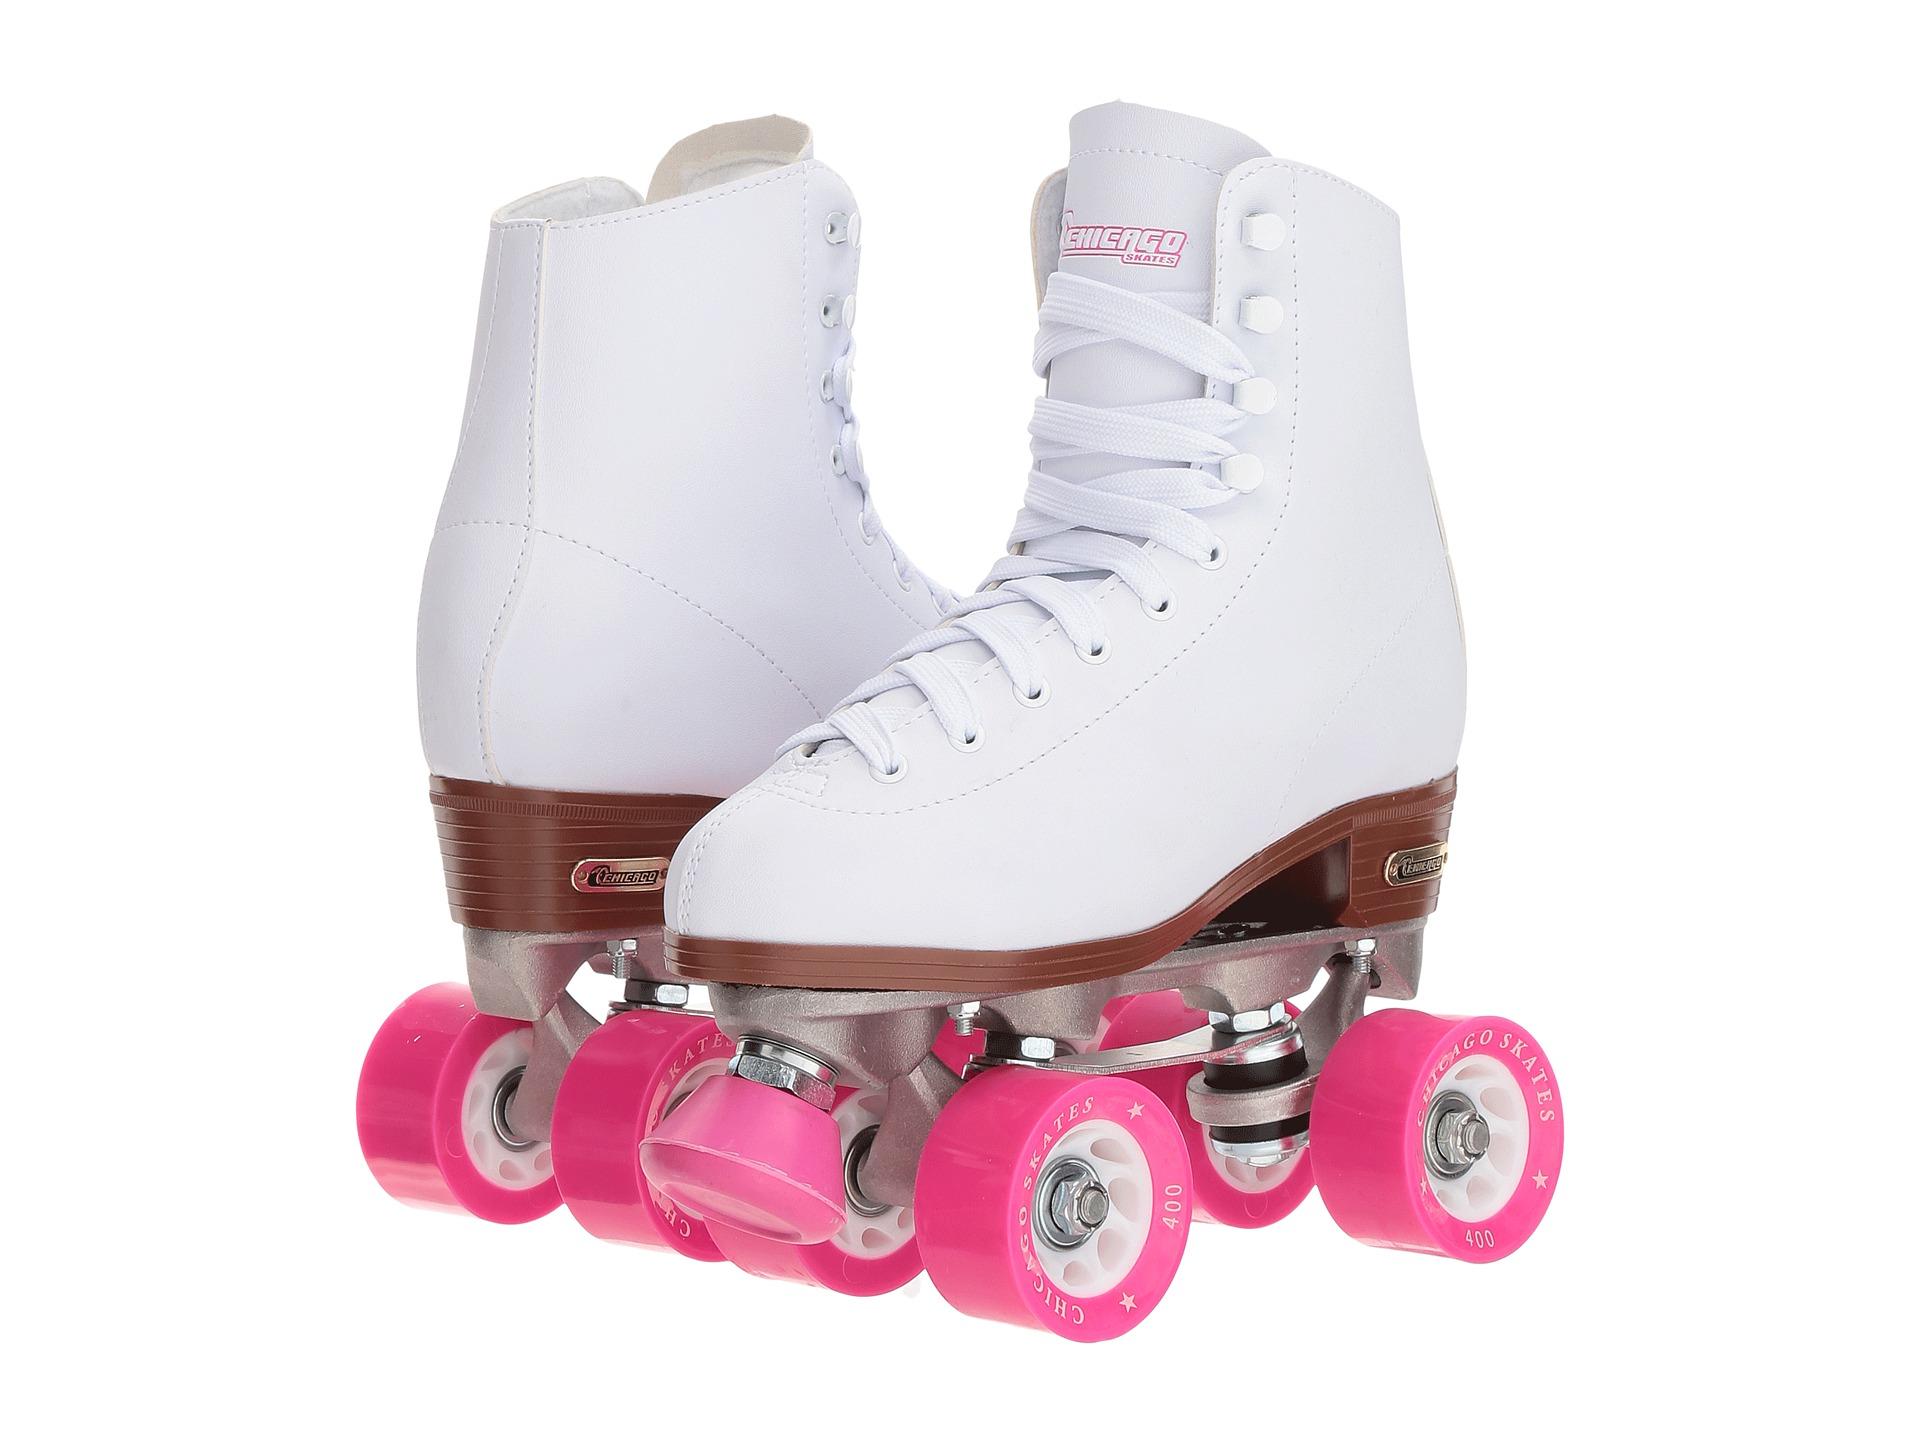 Roller skate shoes size 10 - Roller Skate Shoes Size 10 13